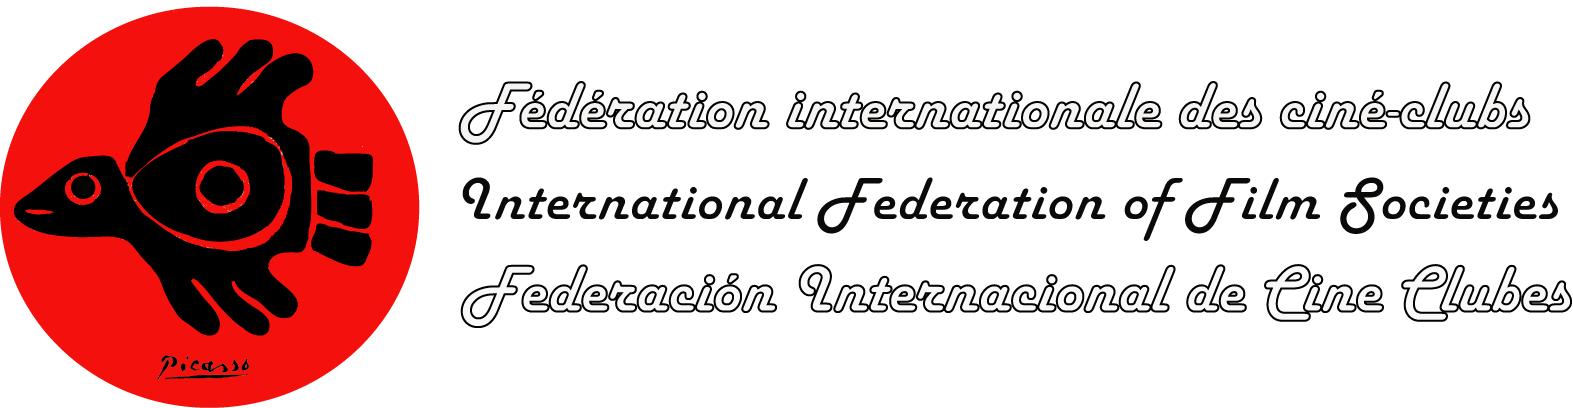 FICC-Logo